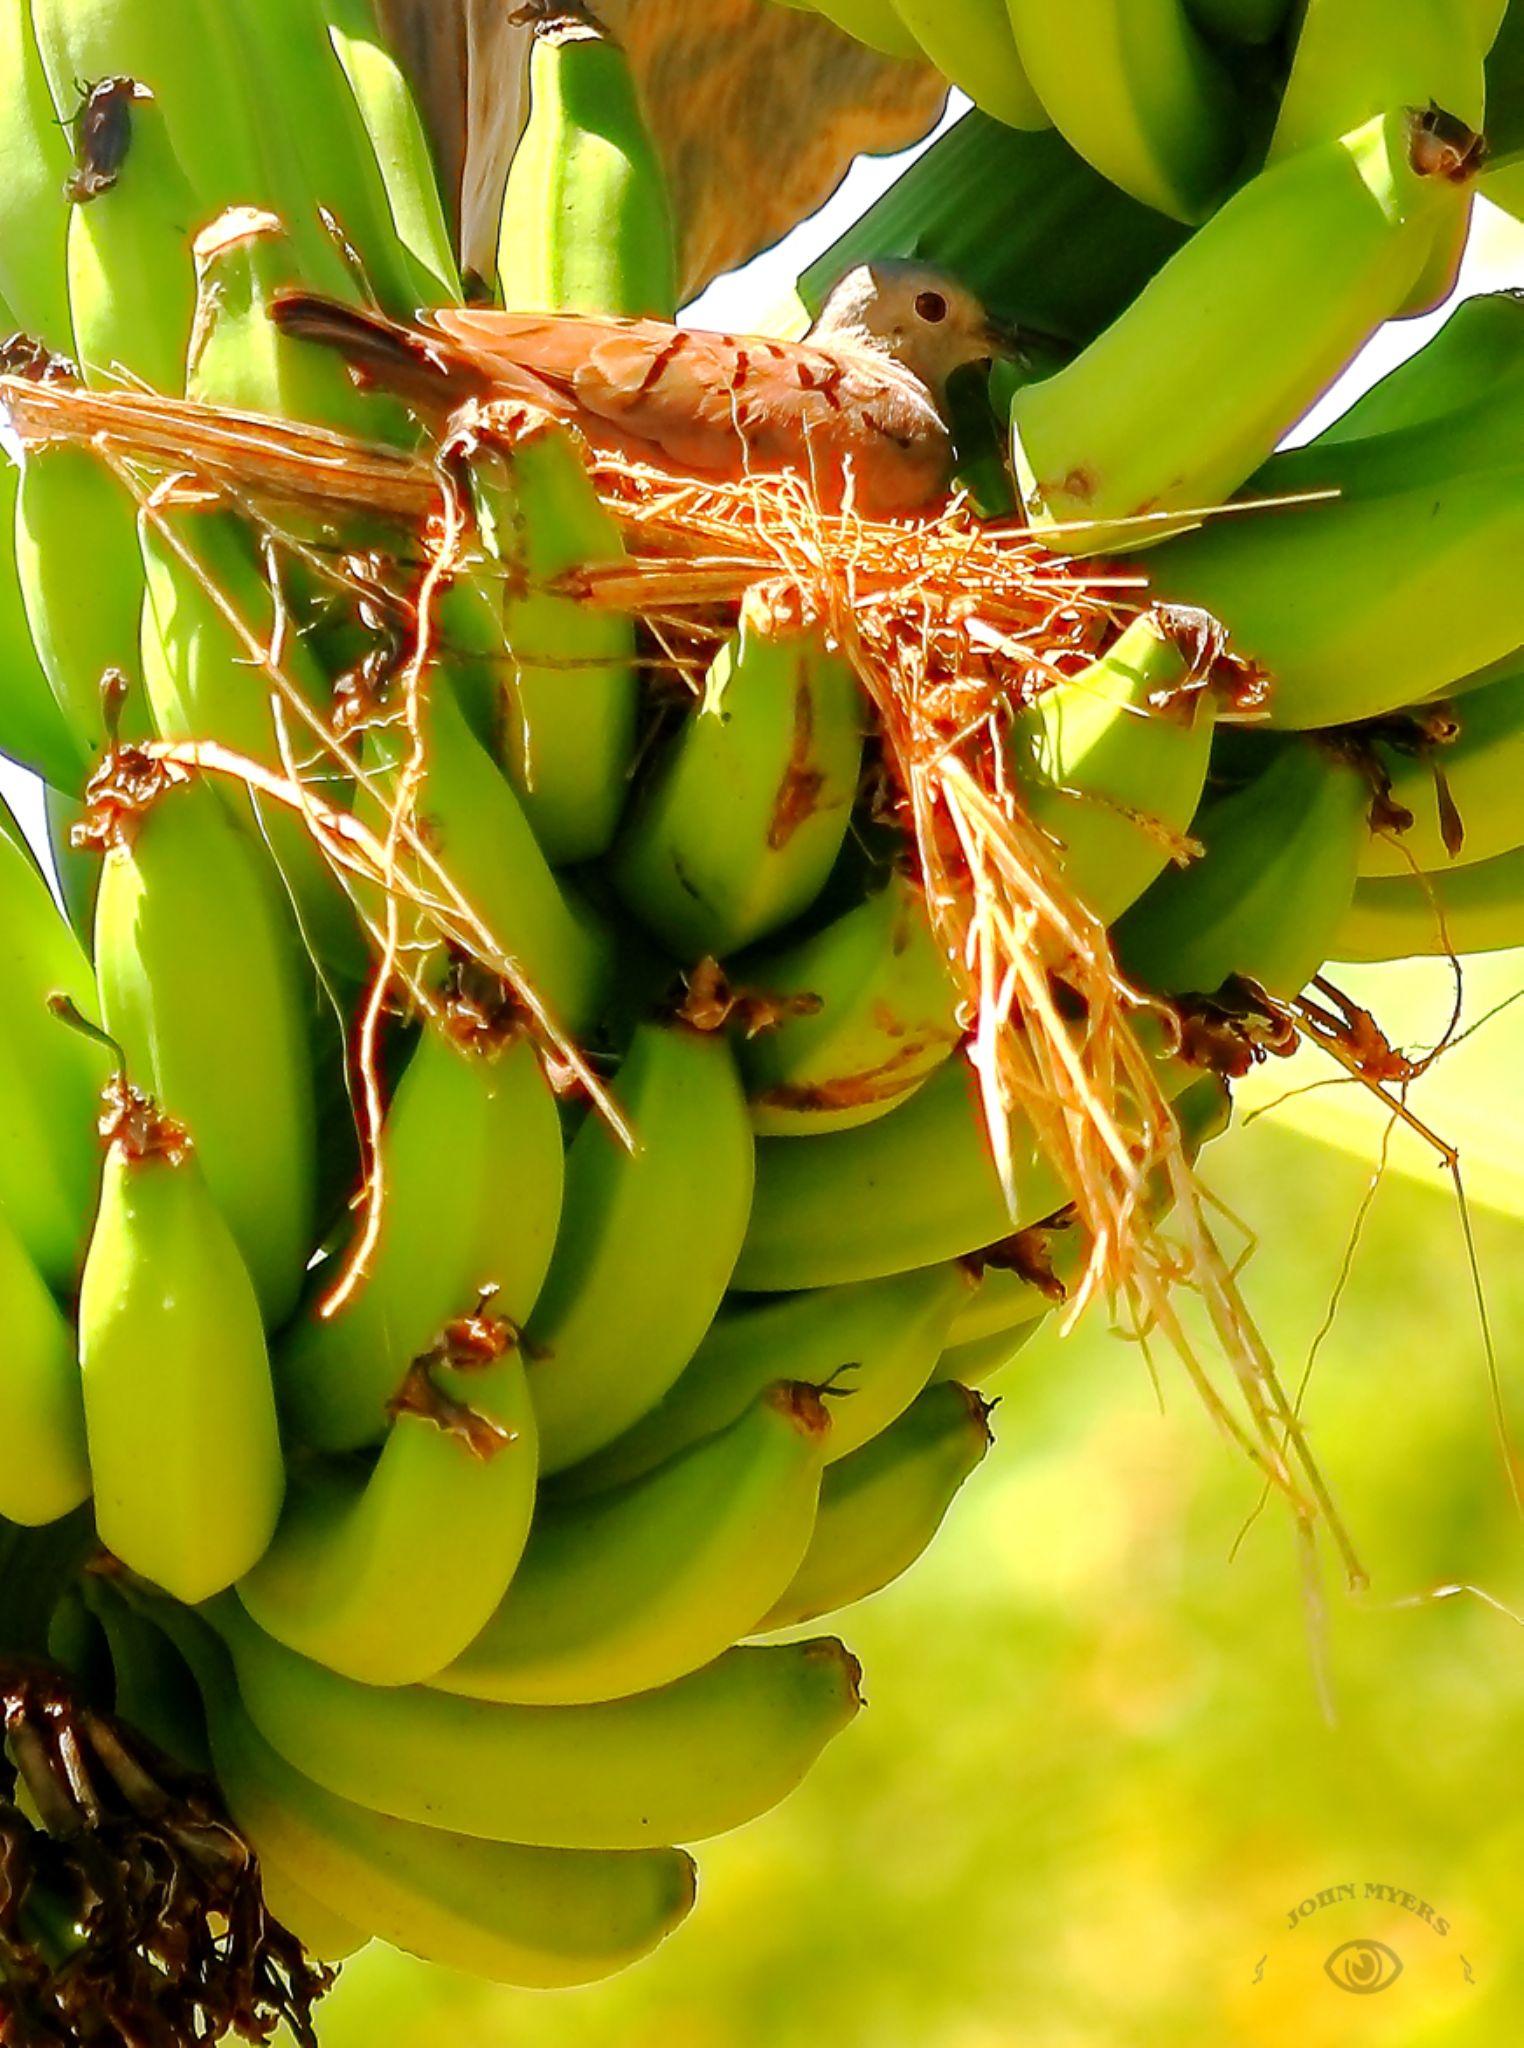 05.09.14 Banana Dove Nest by John T. Myers III